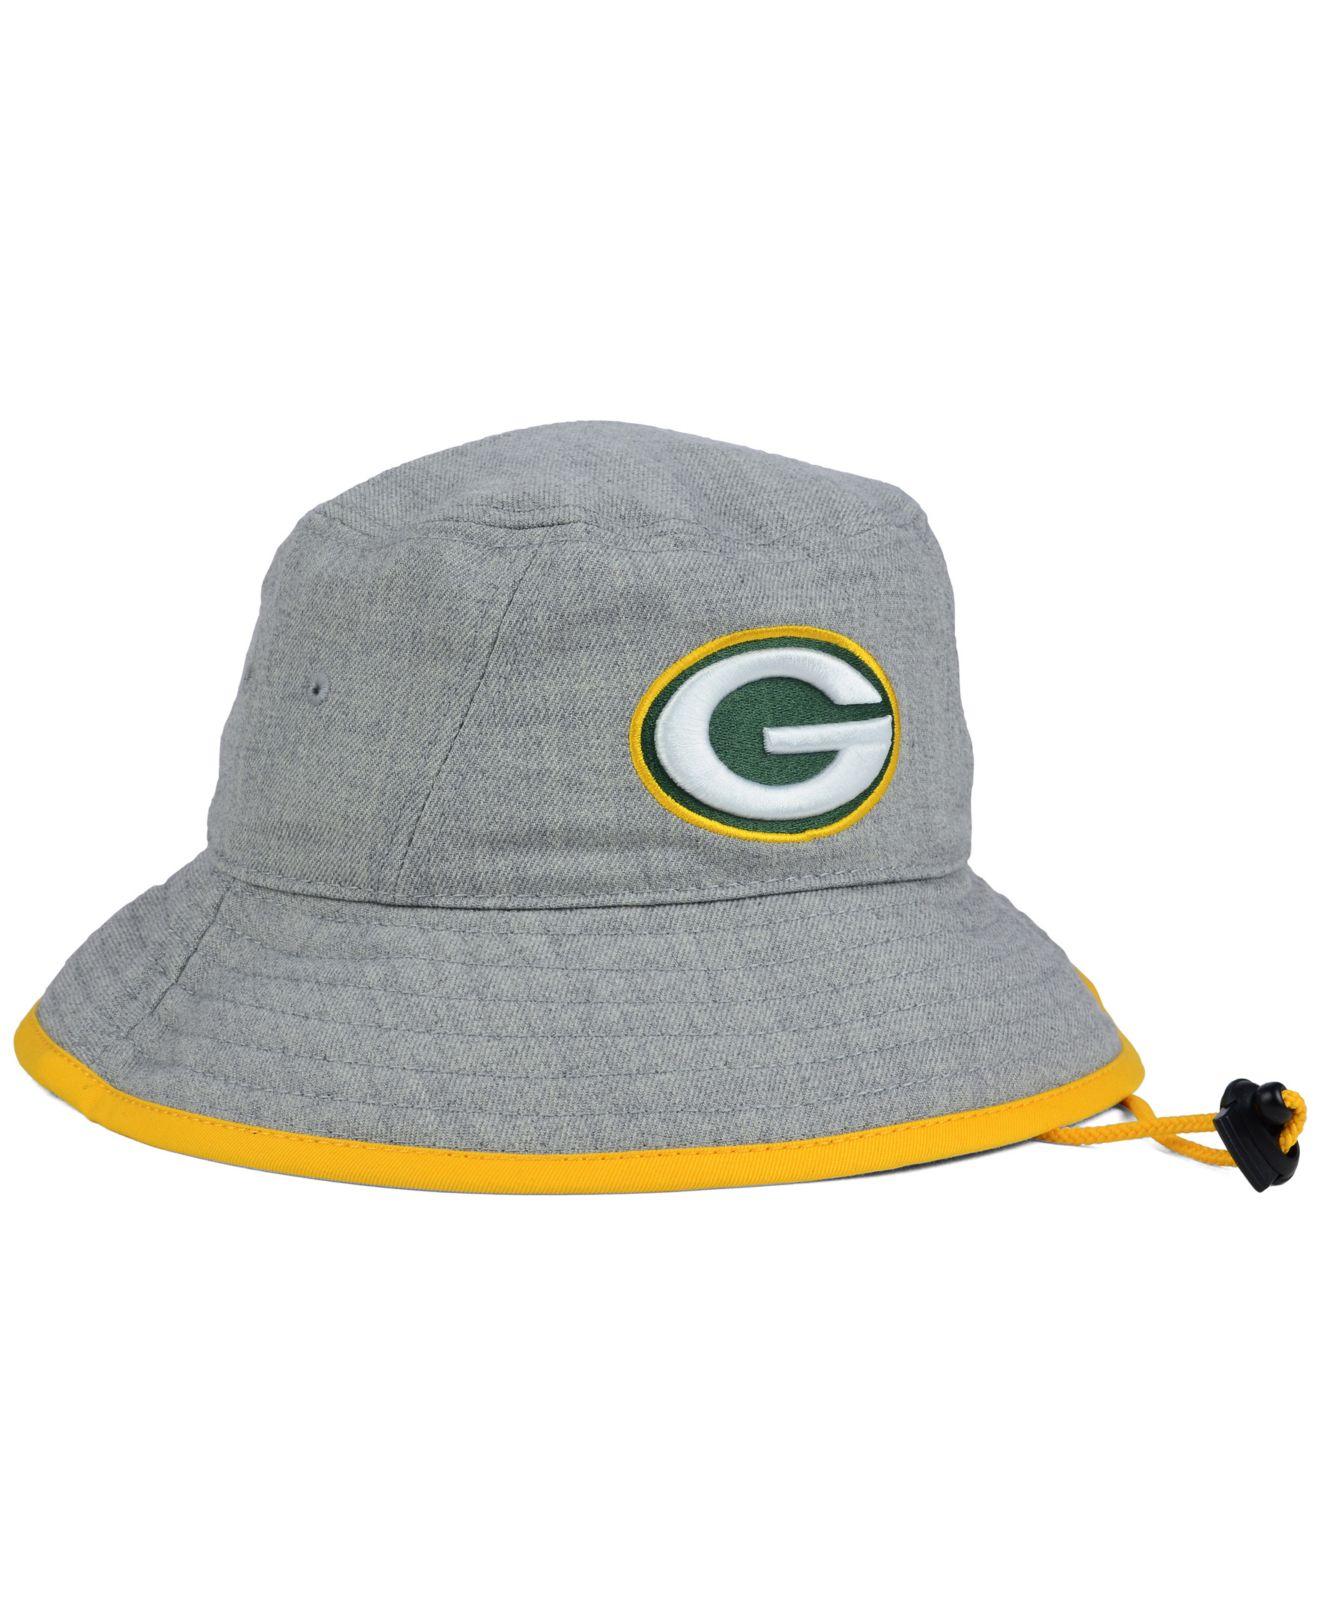 dde833841 KTZ Green Bay Packers Nfl Heather Gray Bucket Hat for men